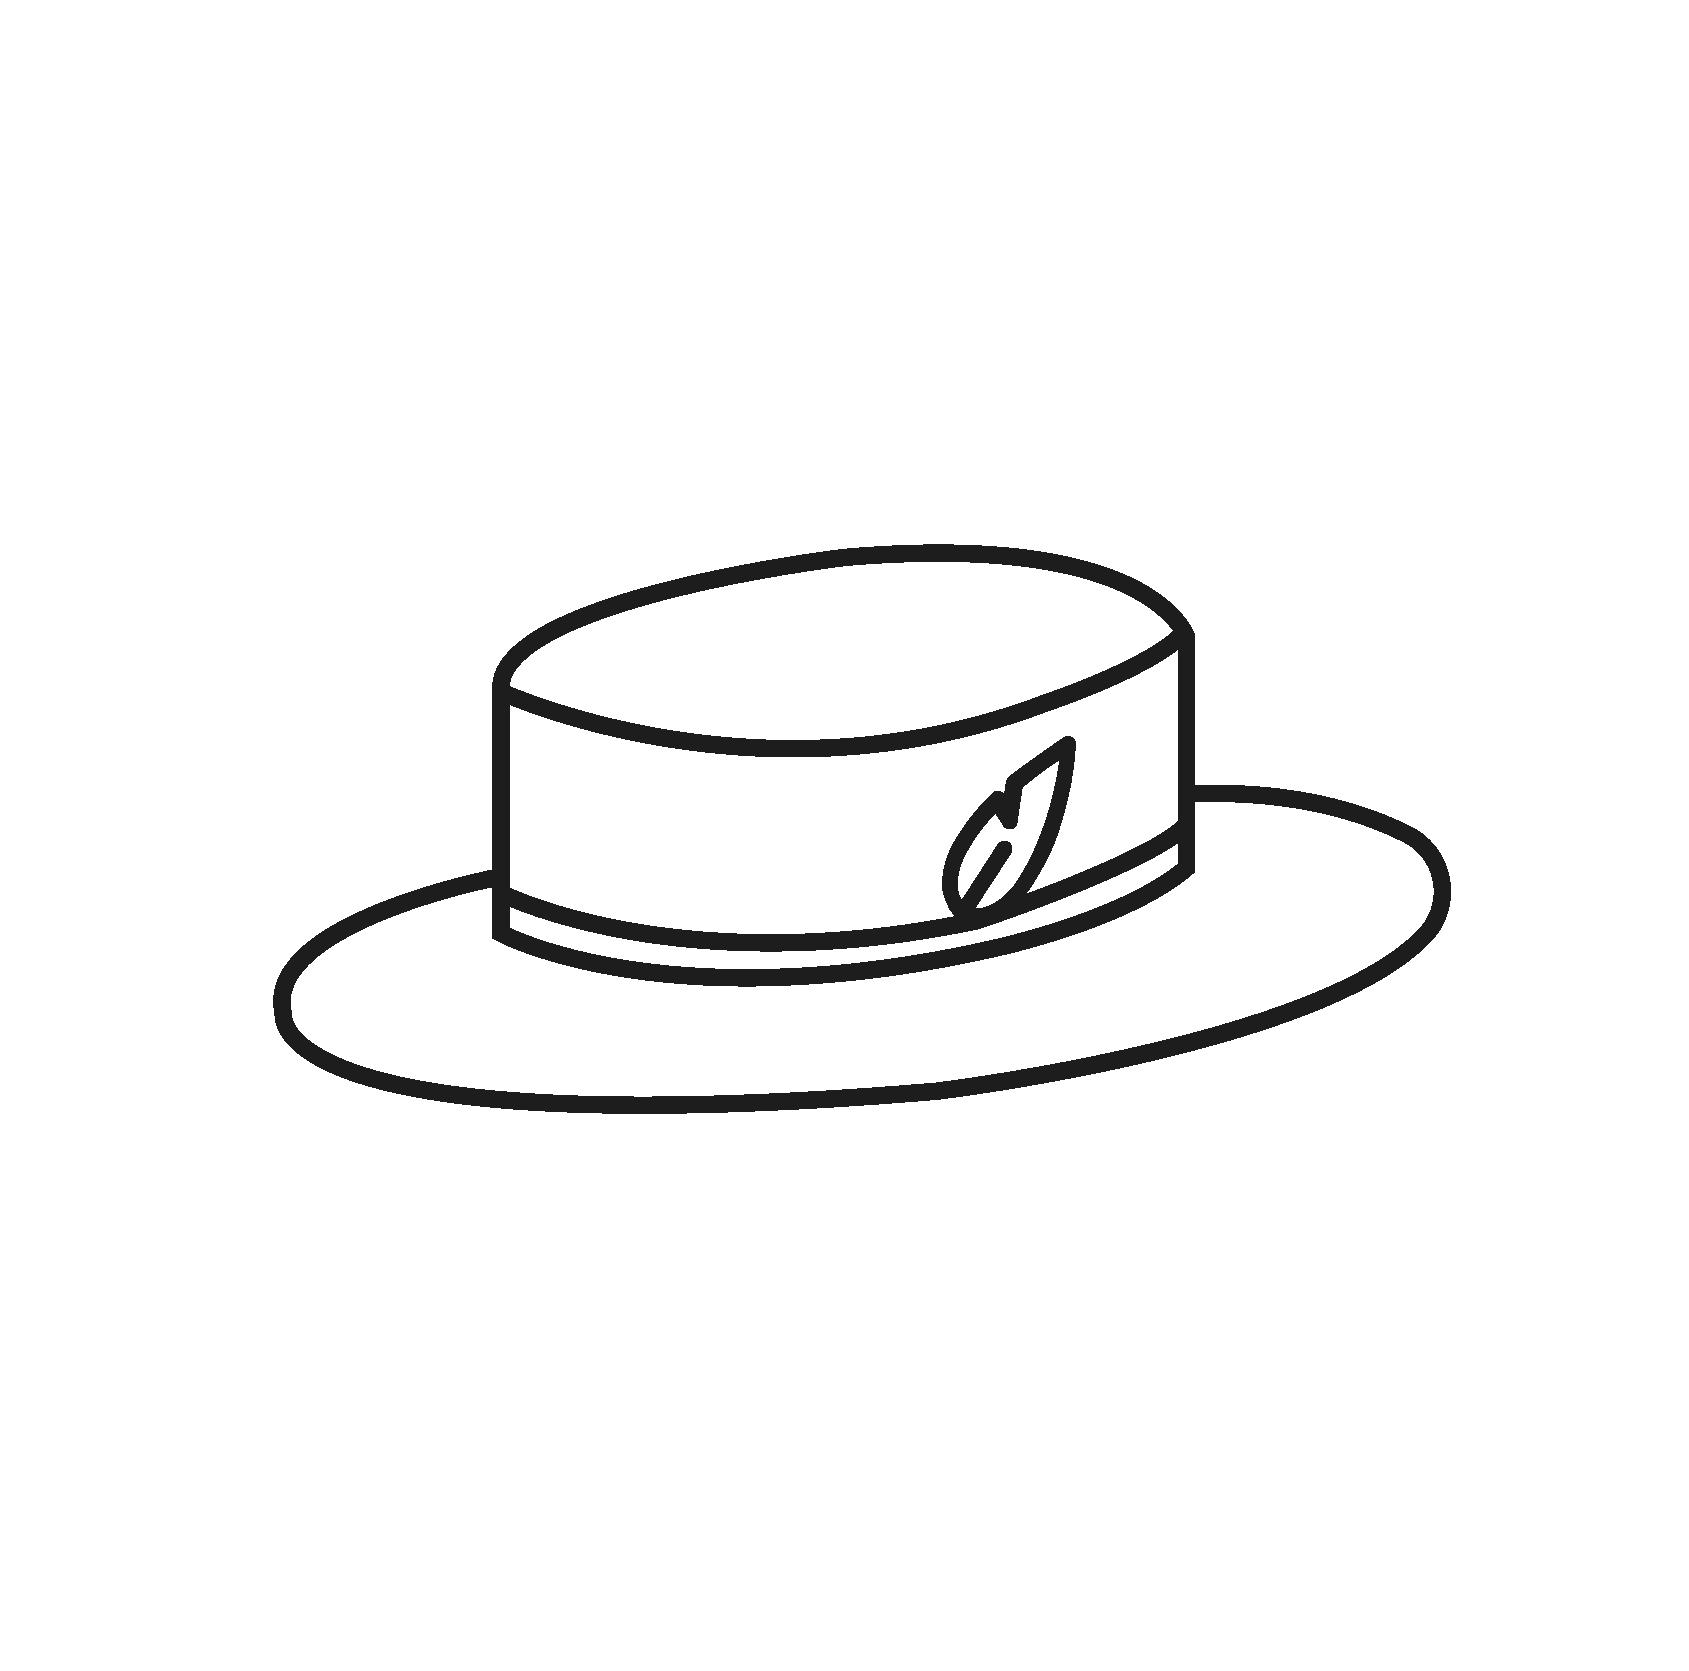 NJB Hat Black 07.png